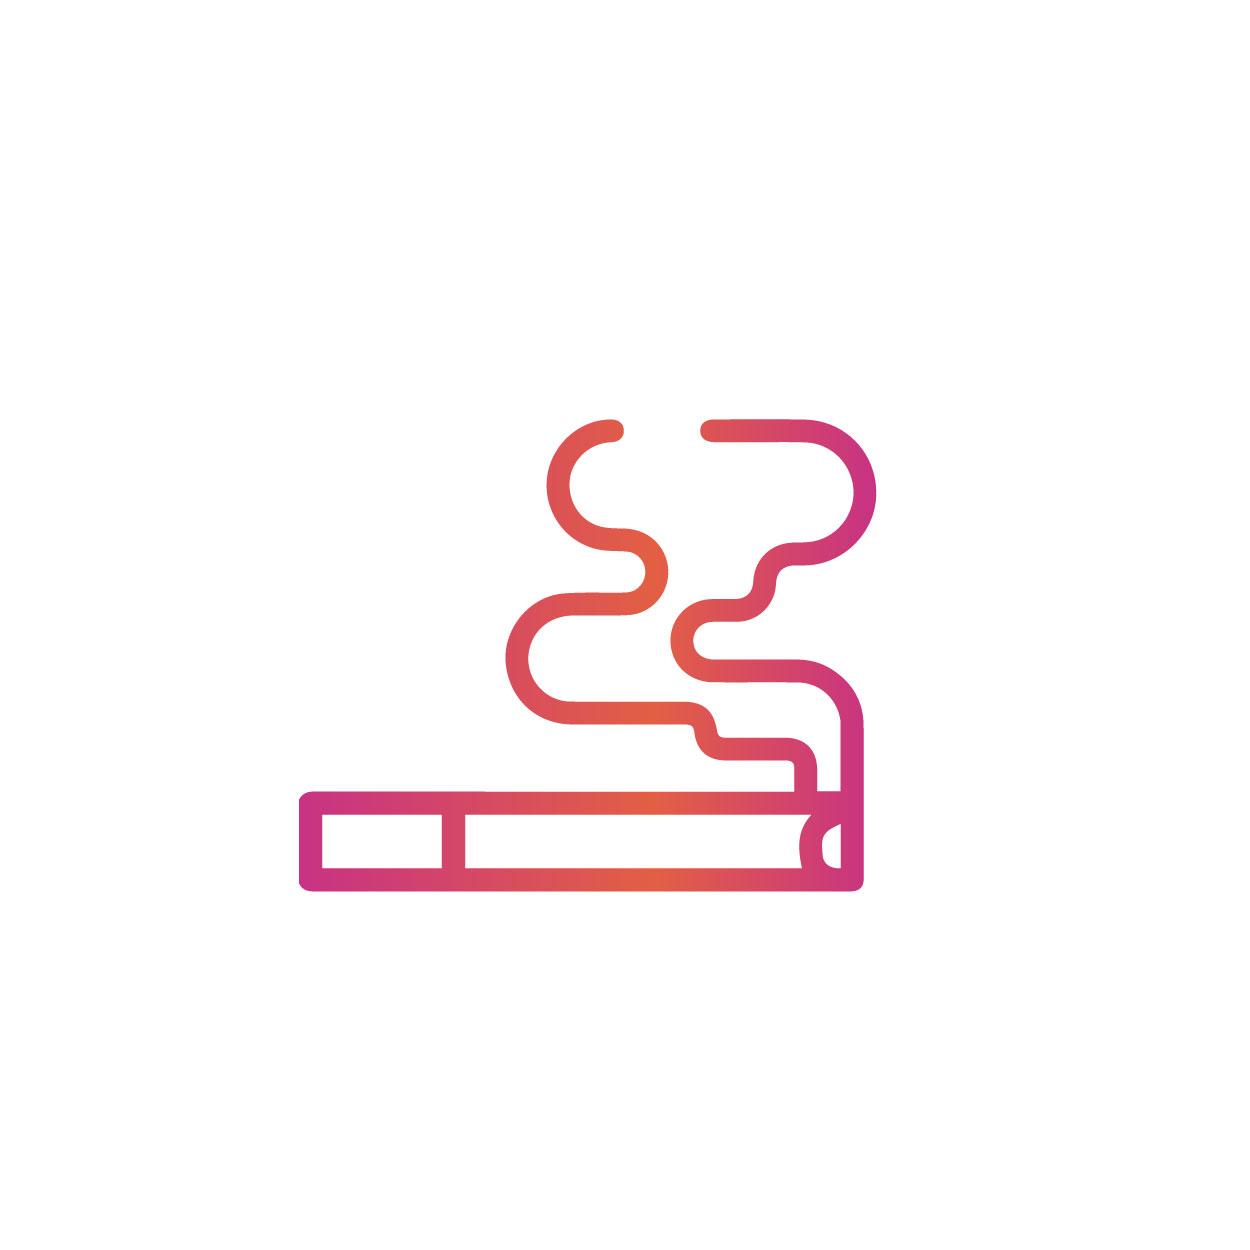 Habitual smoking